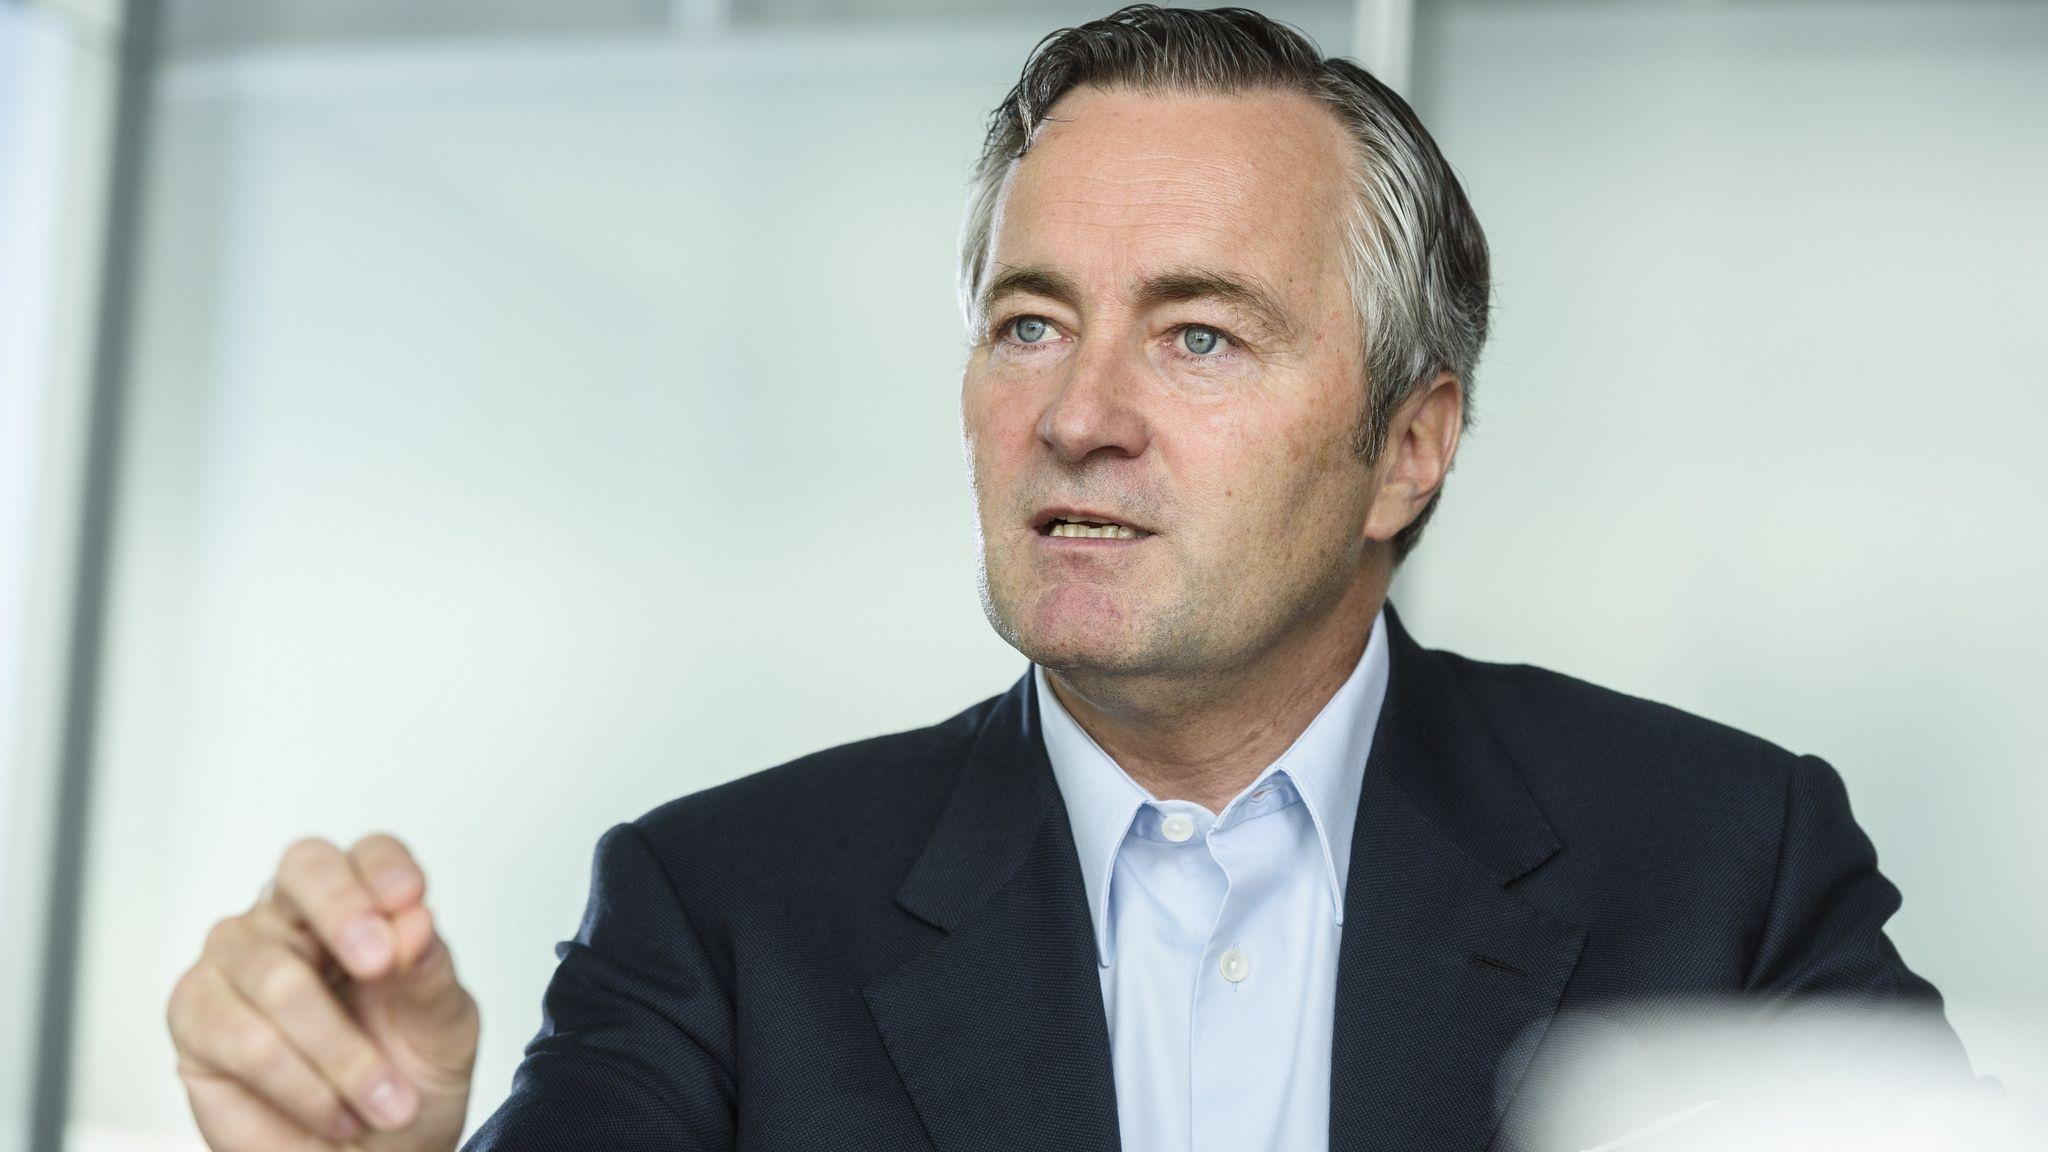 Flugtaxi-Anbieter: Vodafone und EHang vereinbaren 5G-Kooperation